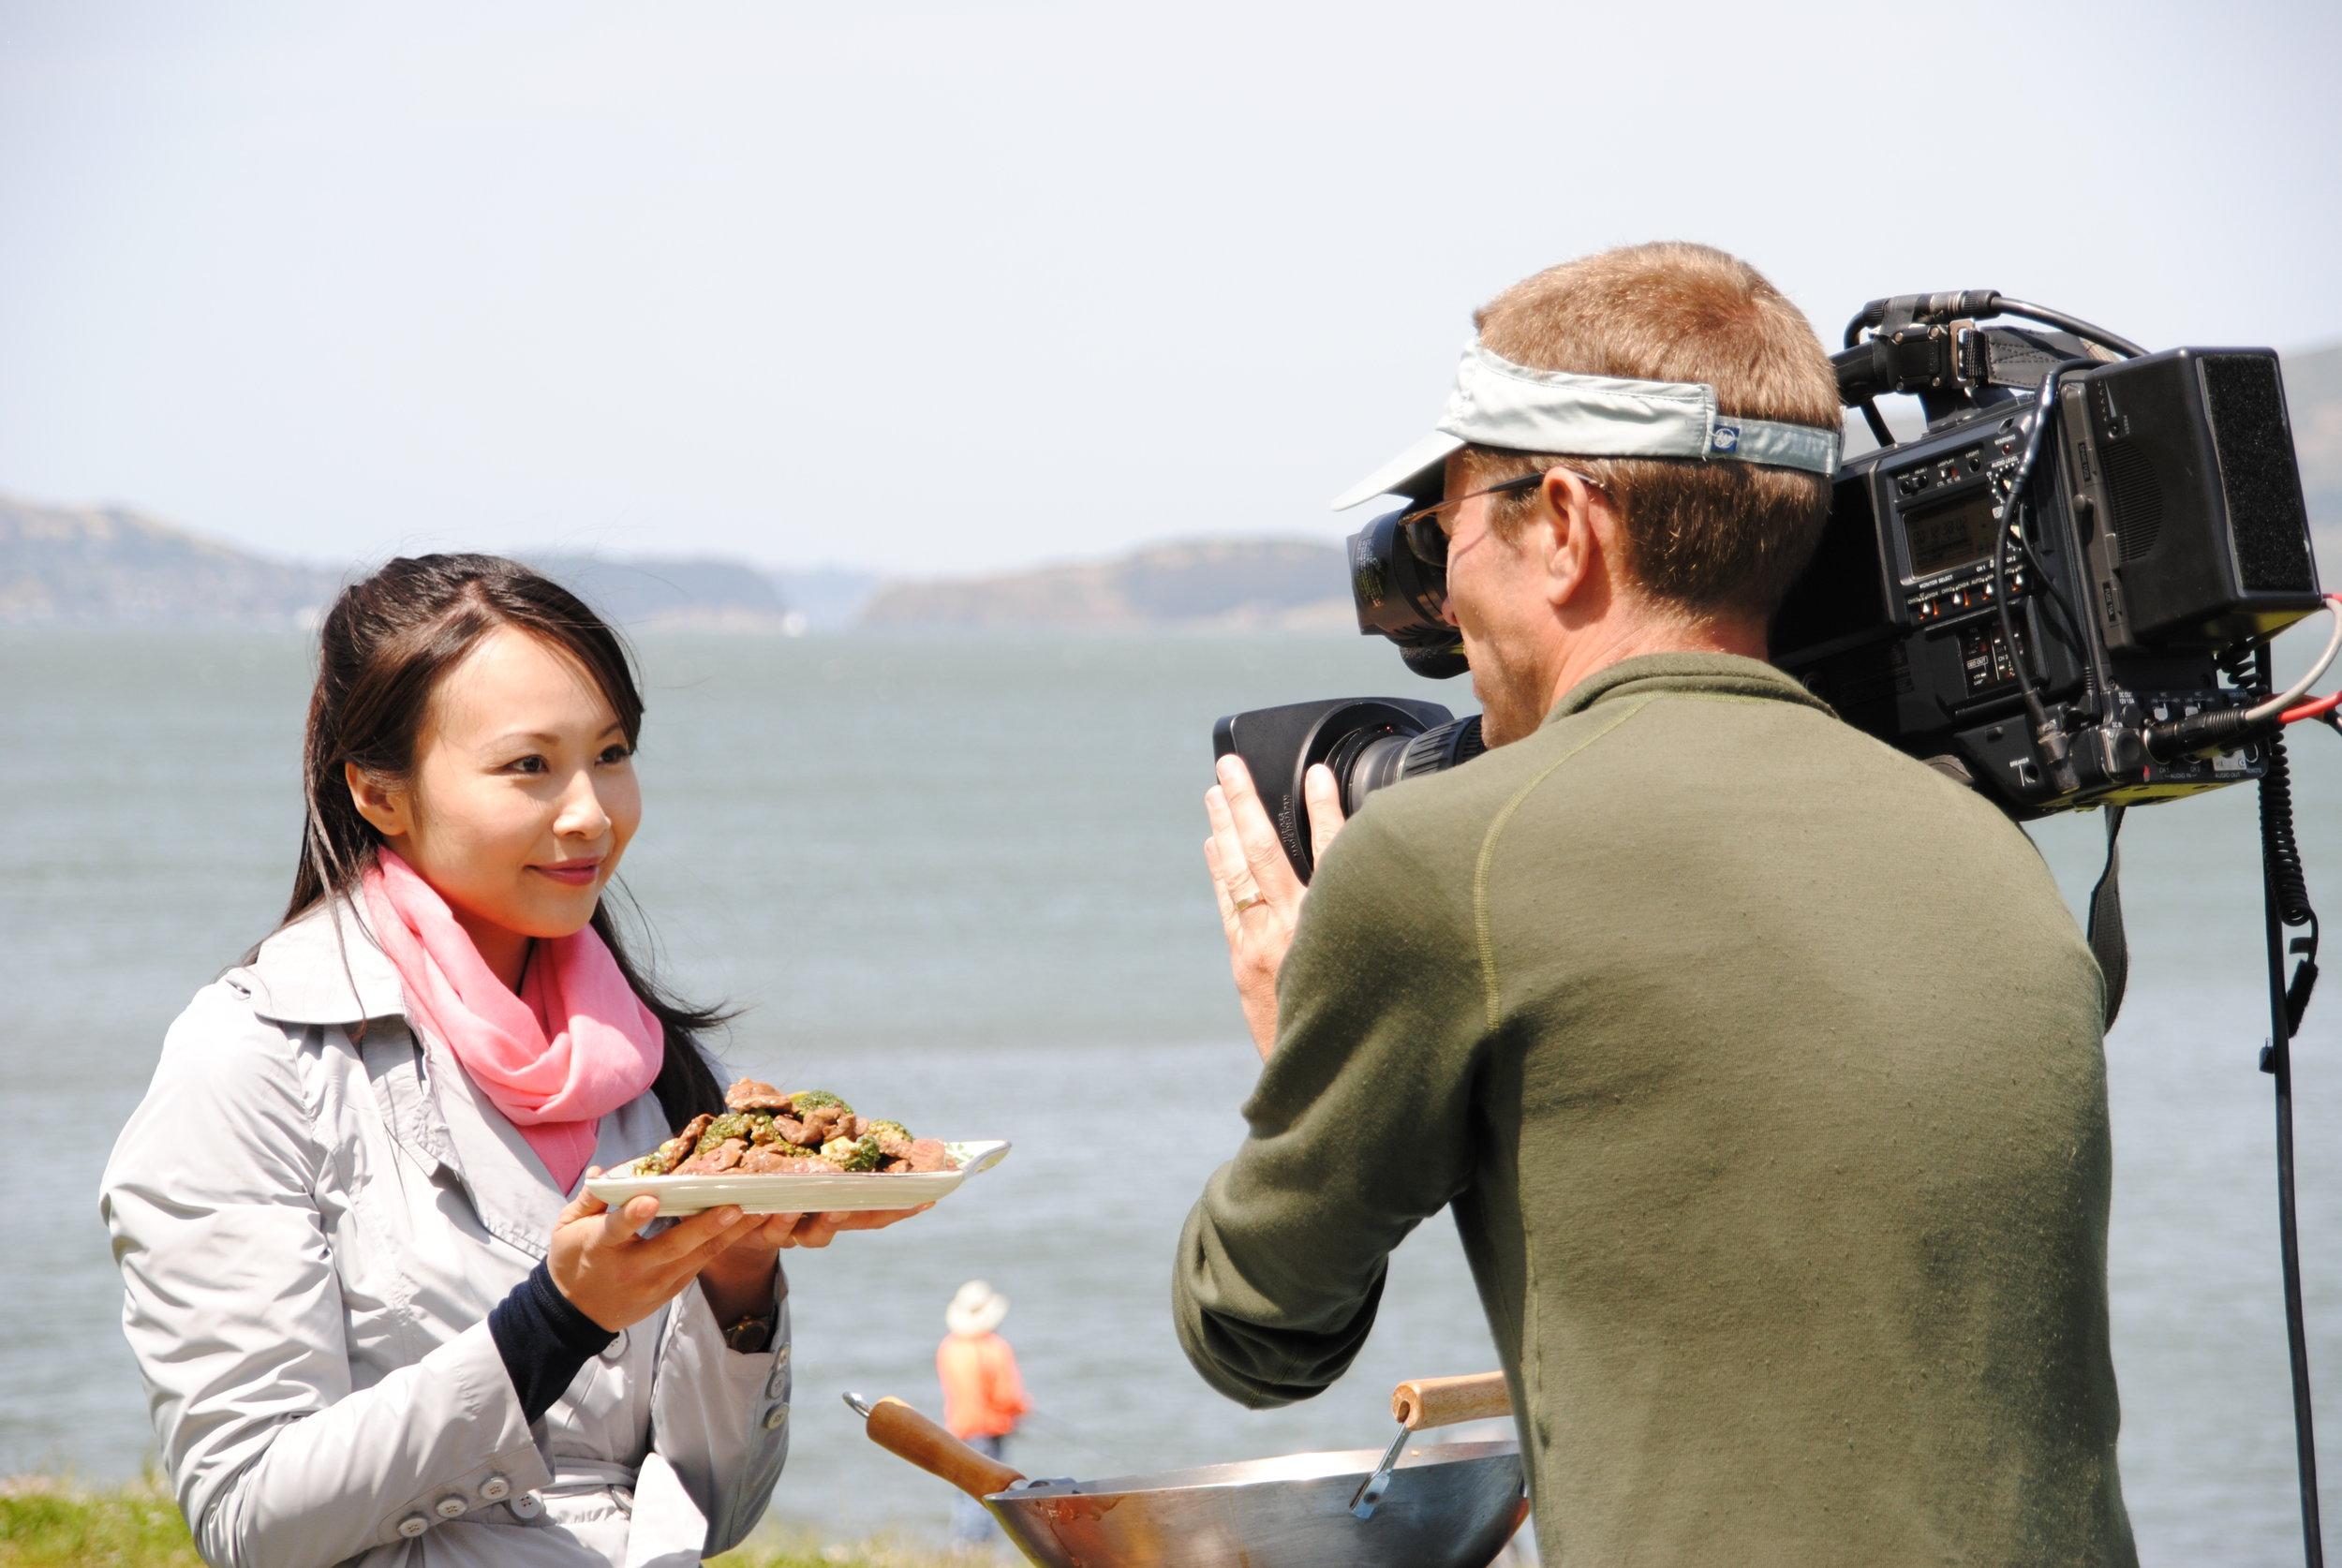 San Fransicso Food network shoot